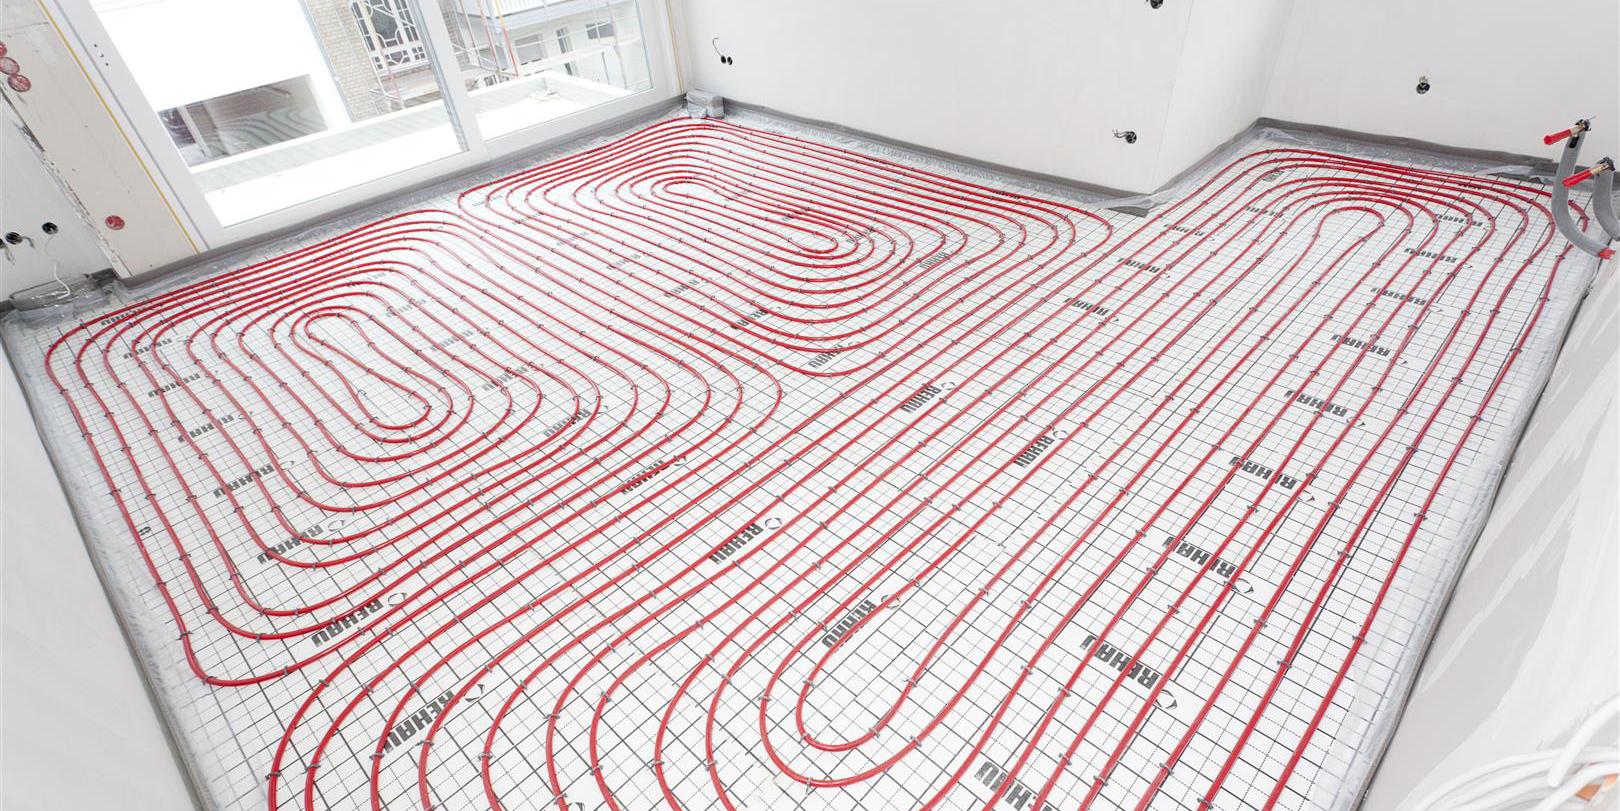 Underfloor heating rehaus